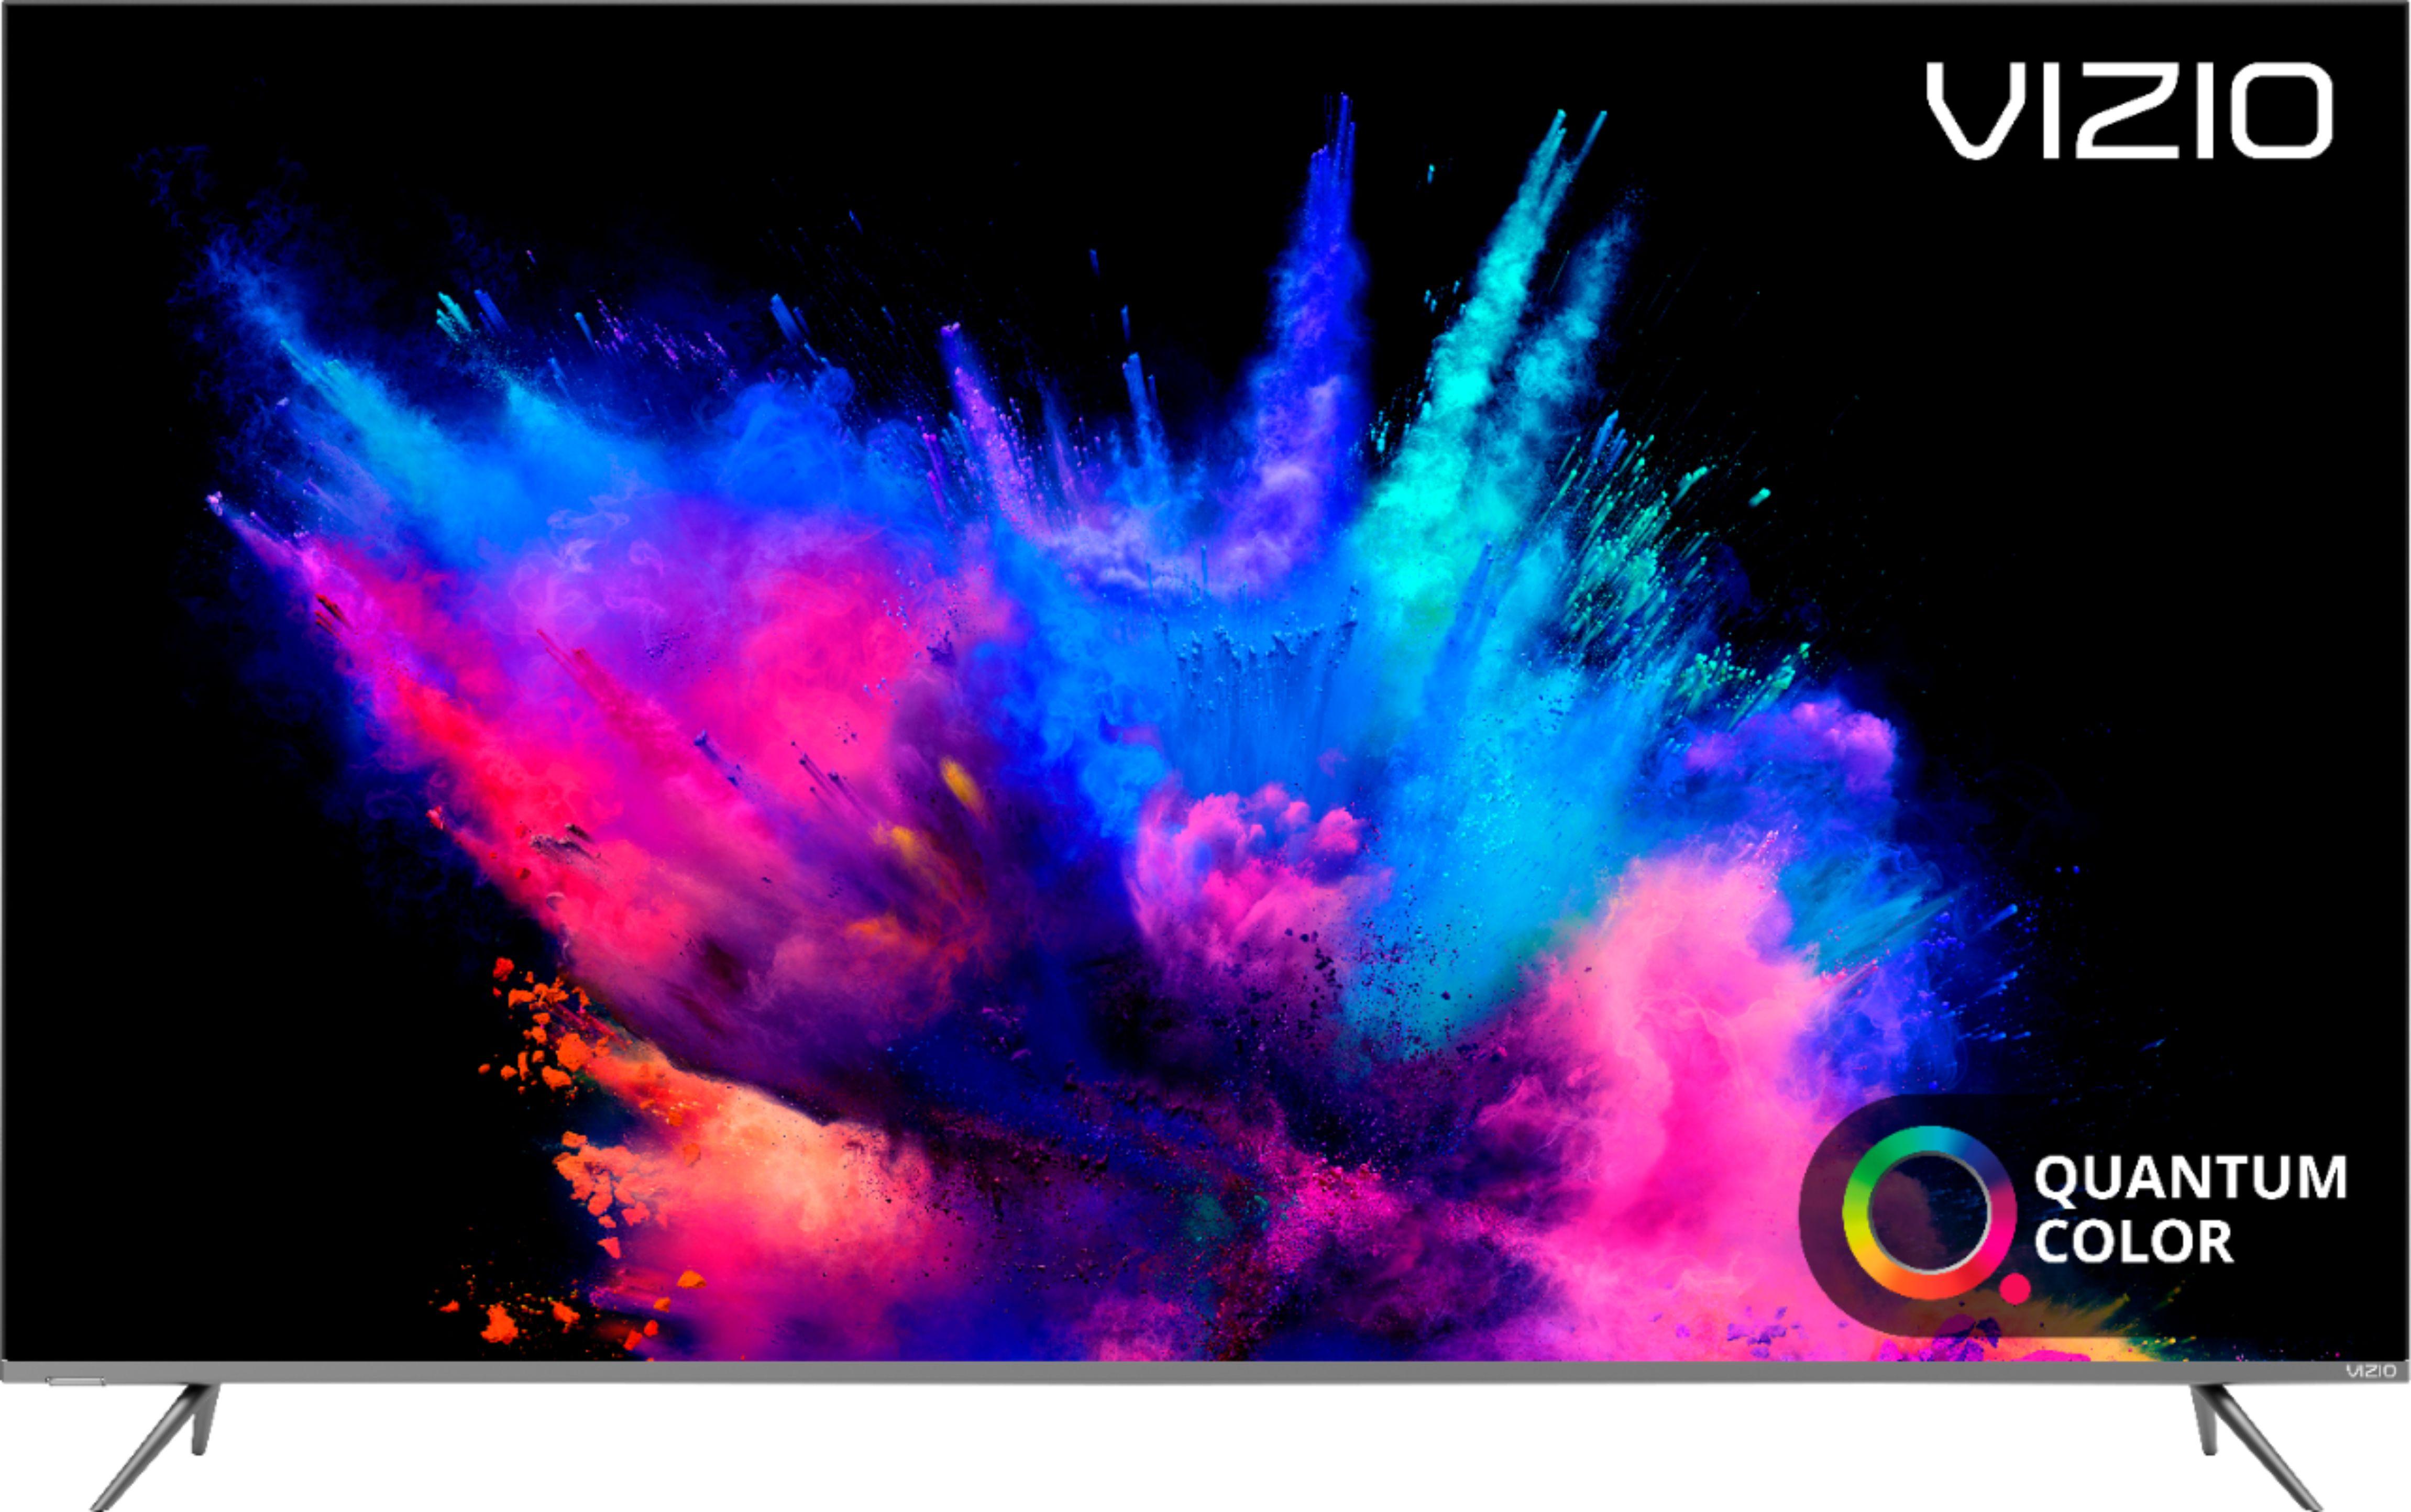 "VIZIO 75"" Class LED P Series Quantum Series 2160p Smart 4K UHD TV with HDR P759-G1 - Best Buy $1800"